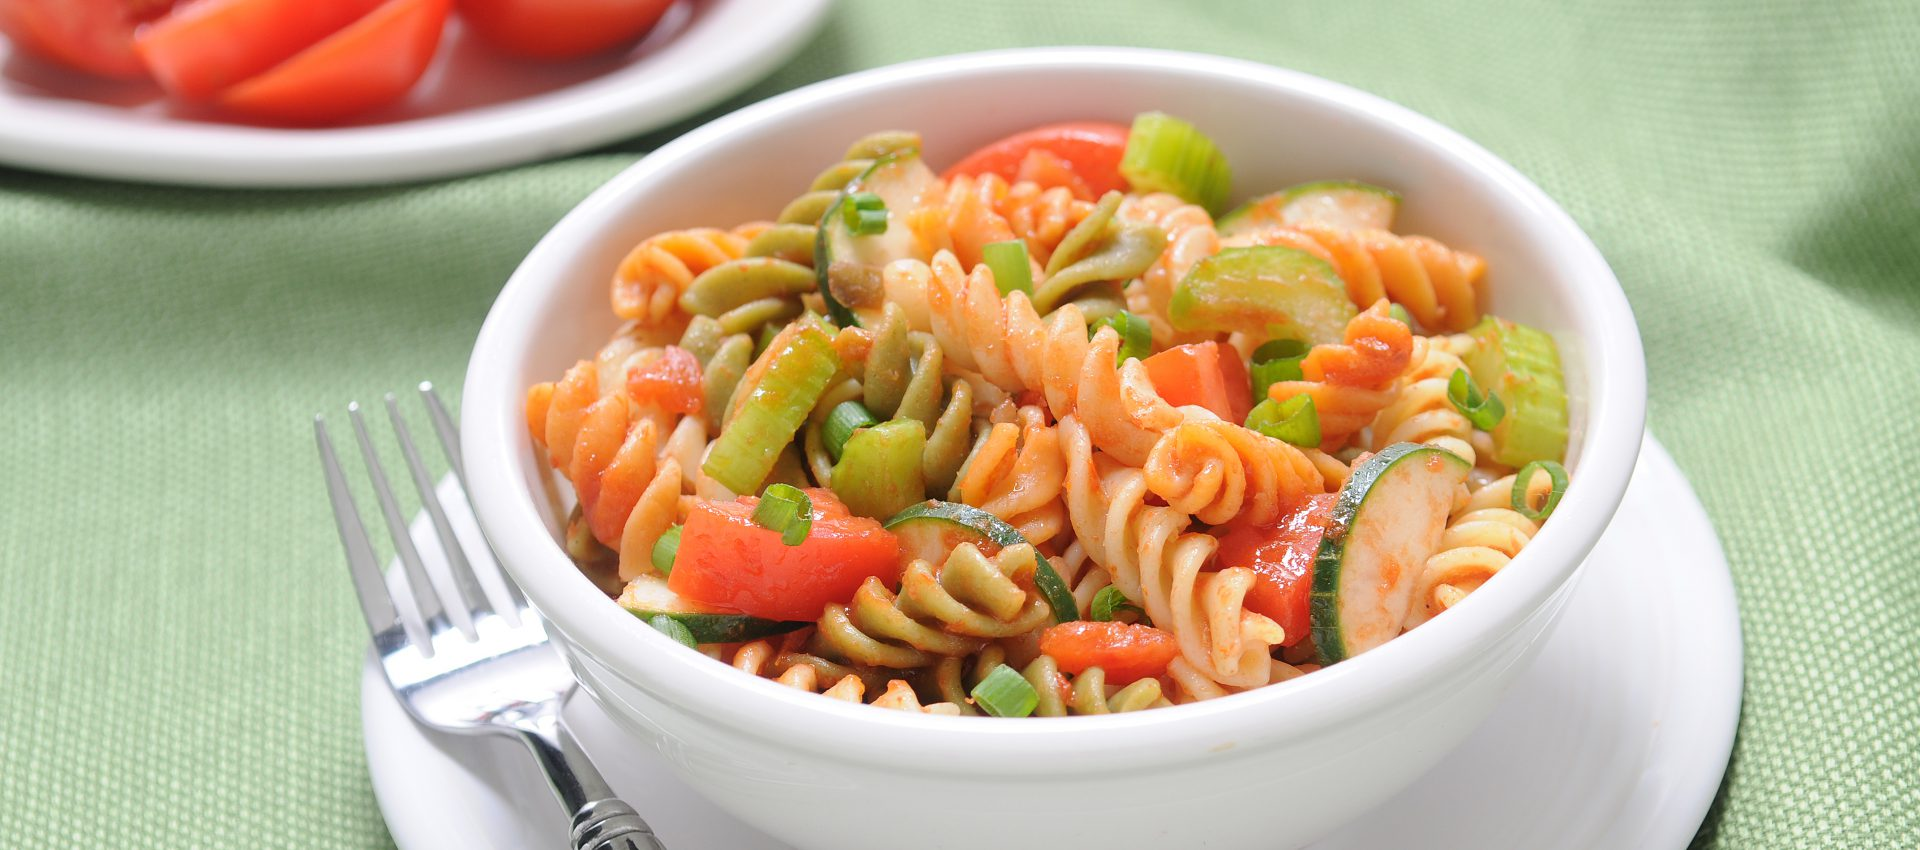 Fiesta-Garden-Rotini-Salad-HR-1920x850 Fiesta Tri-Color Rotini Salad